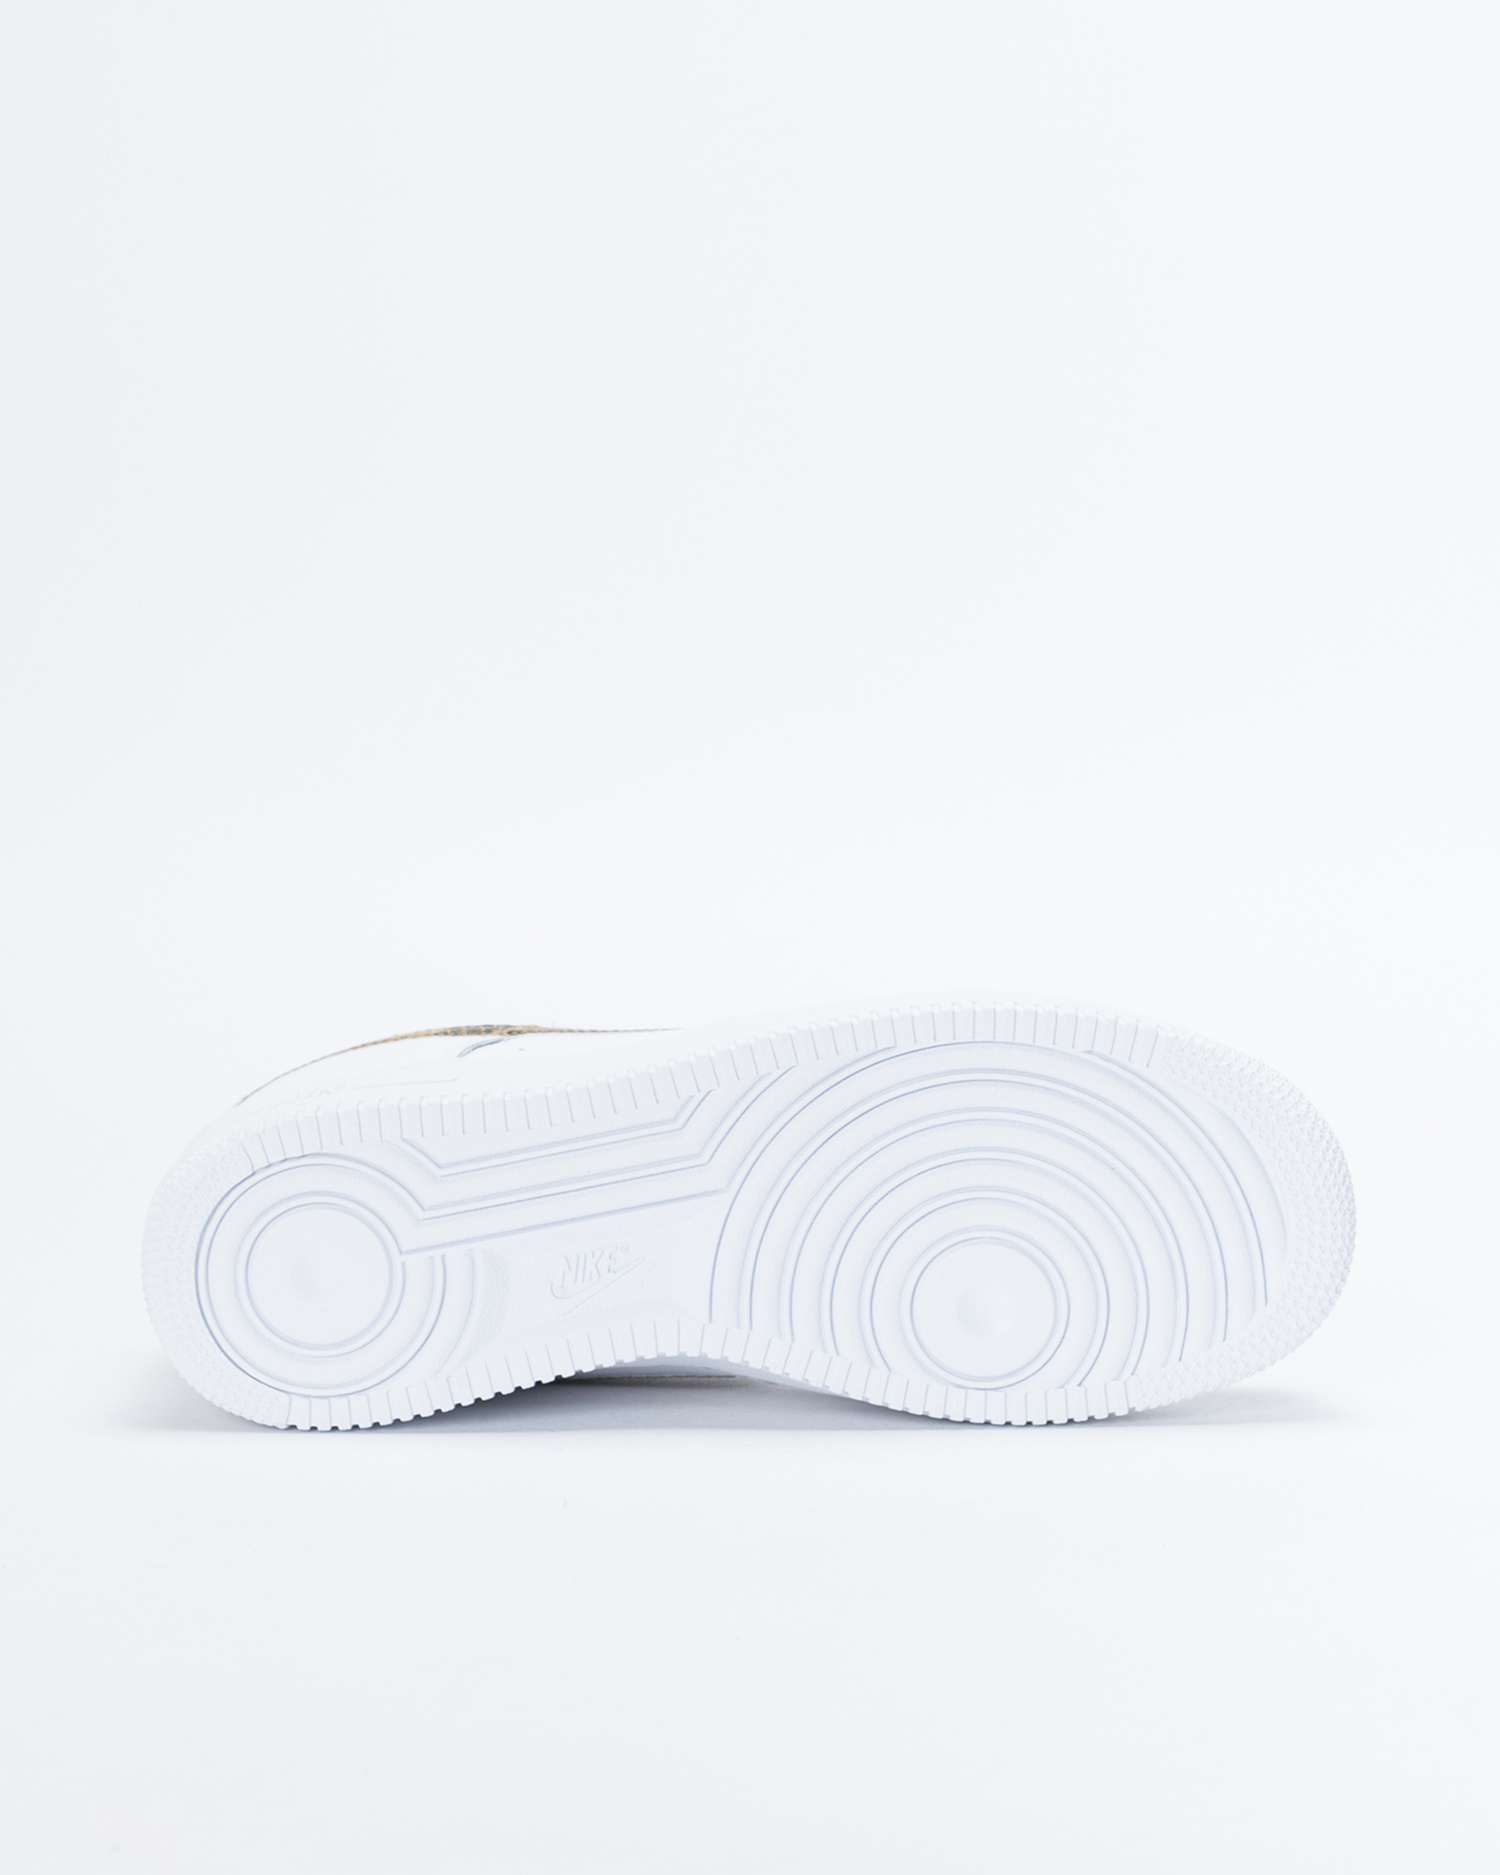 Nike Air Force 1 Low Retro Prm QS White/Elemental Gold-Dark Hazel-Black